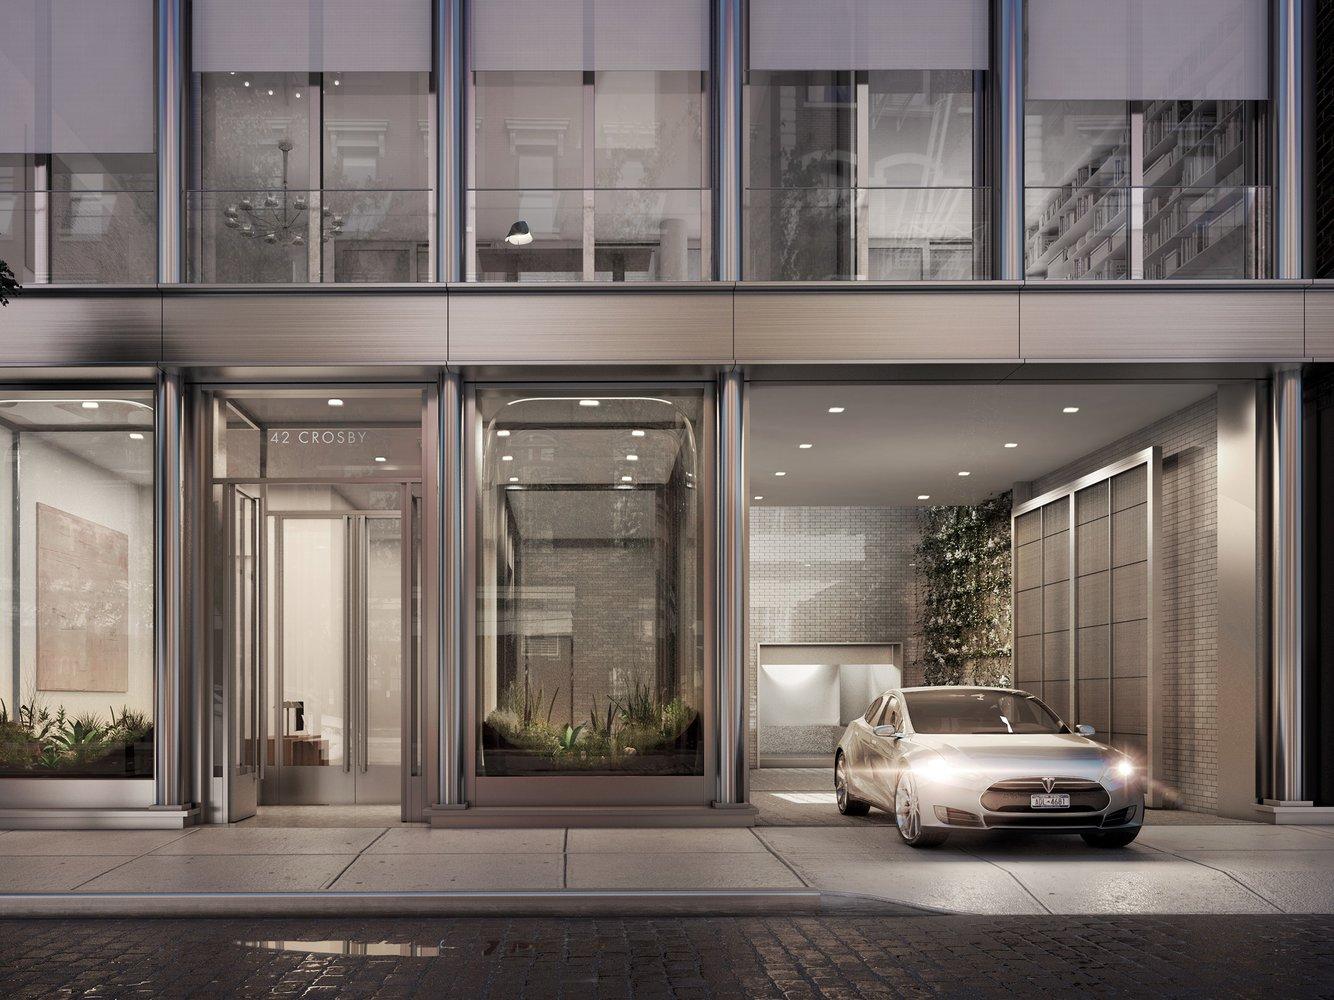 $1 million dollar parking spot in new york